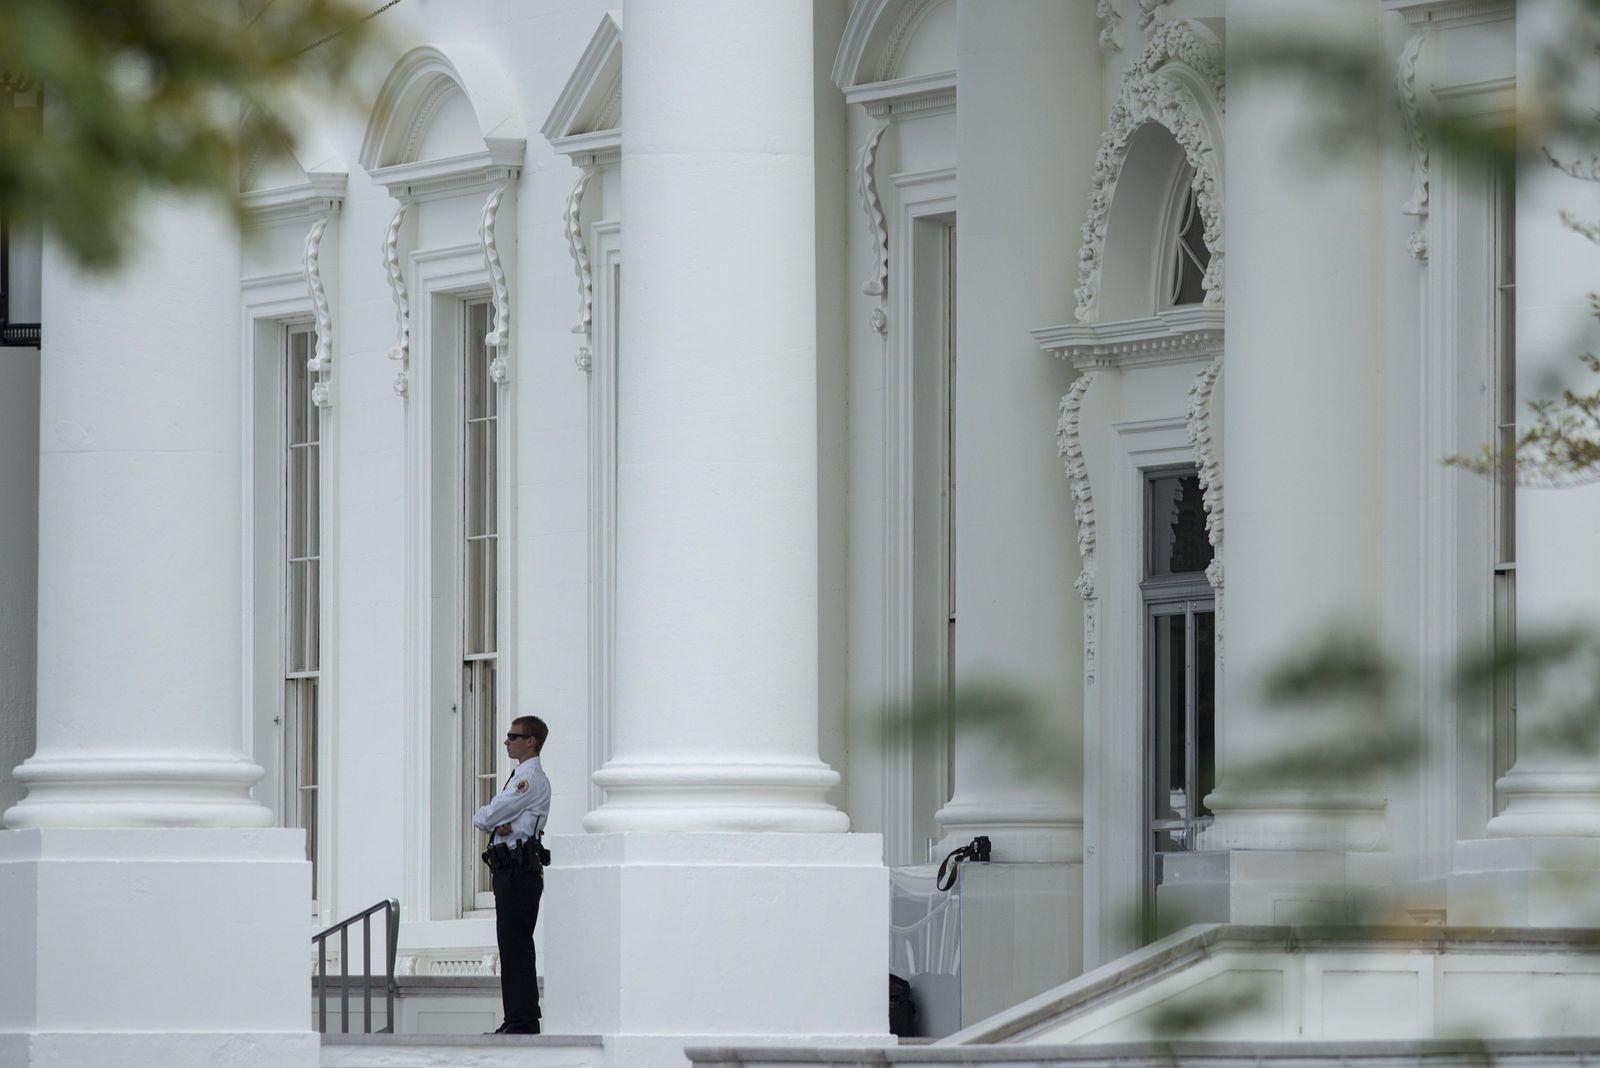 US-POLITICS-SECURITY-WHITE HOUSE